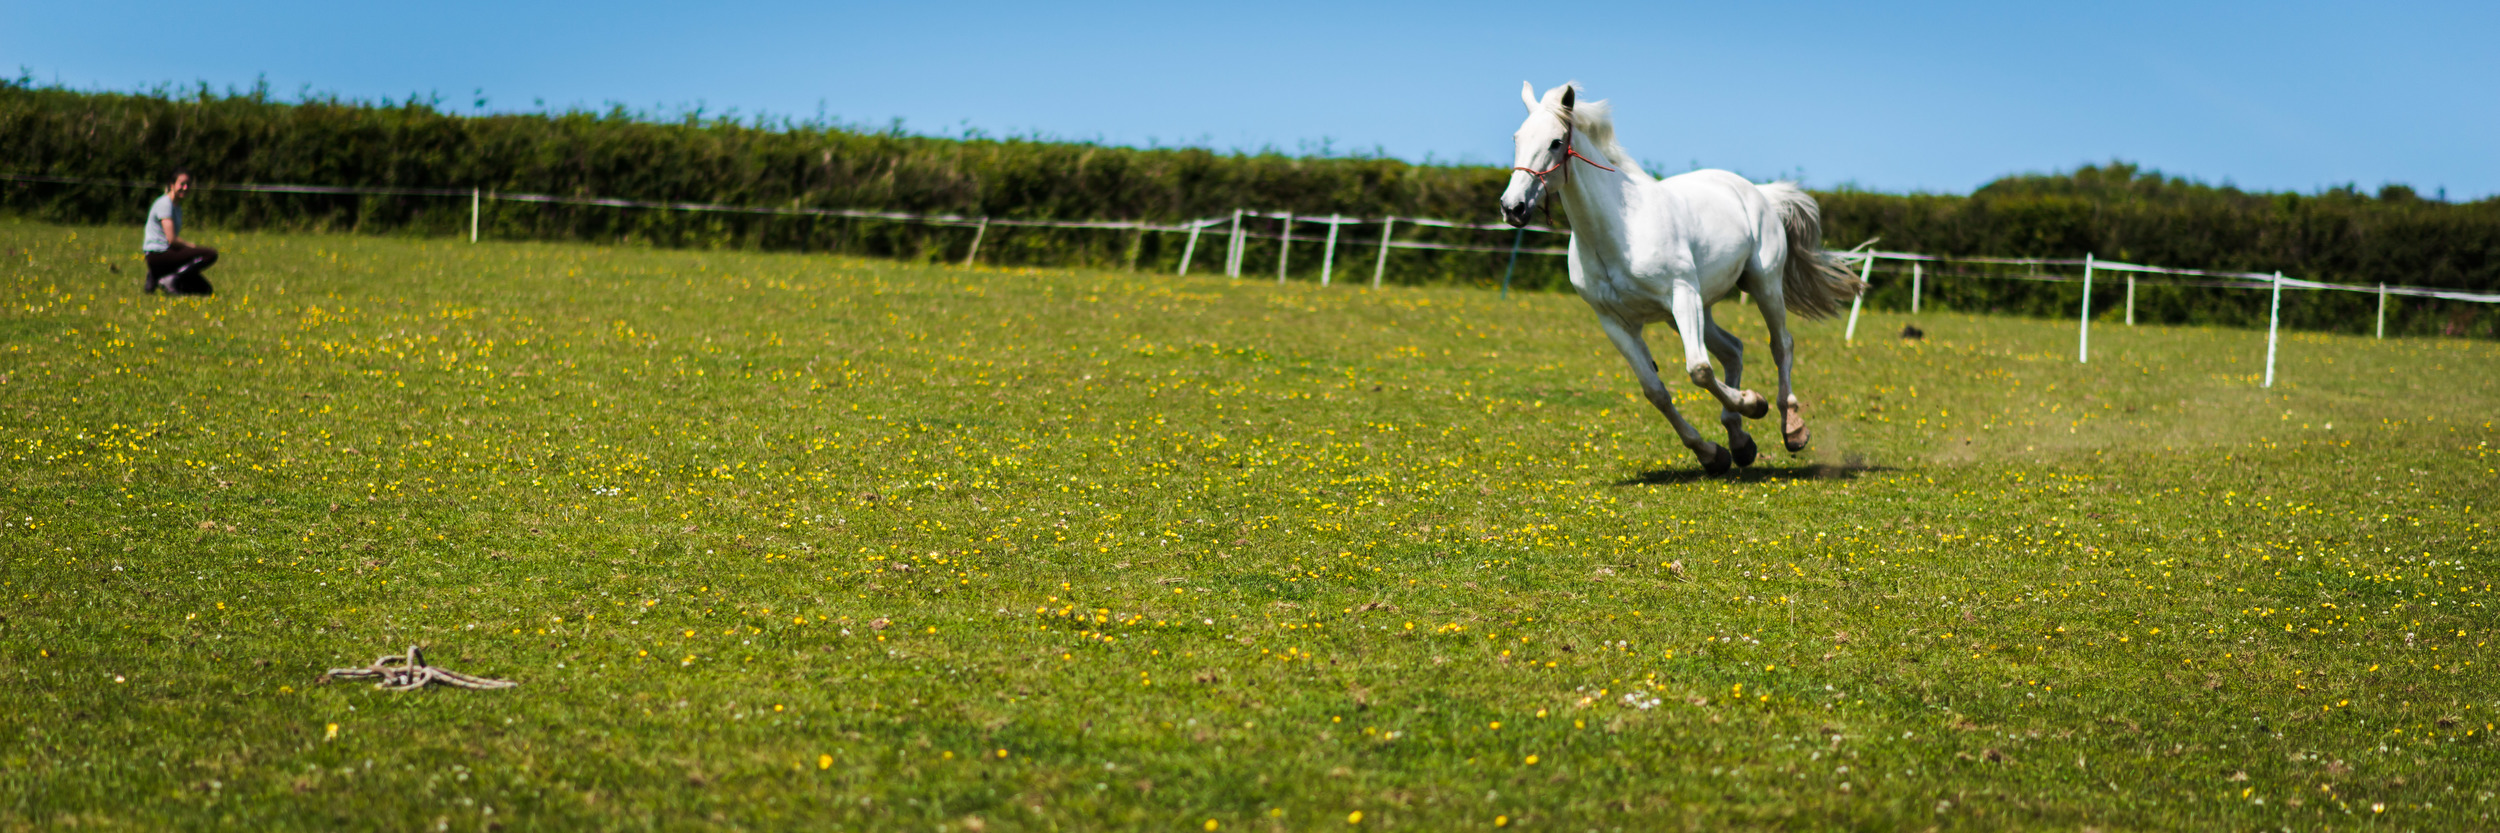 PLP_Horses_JessD_15-9.jpg